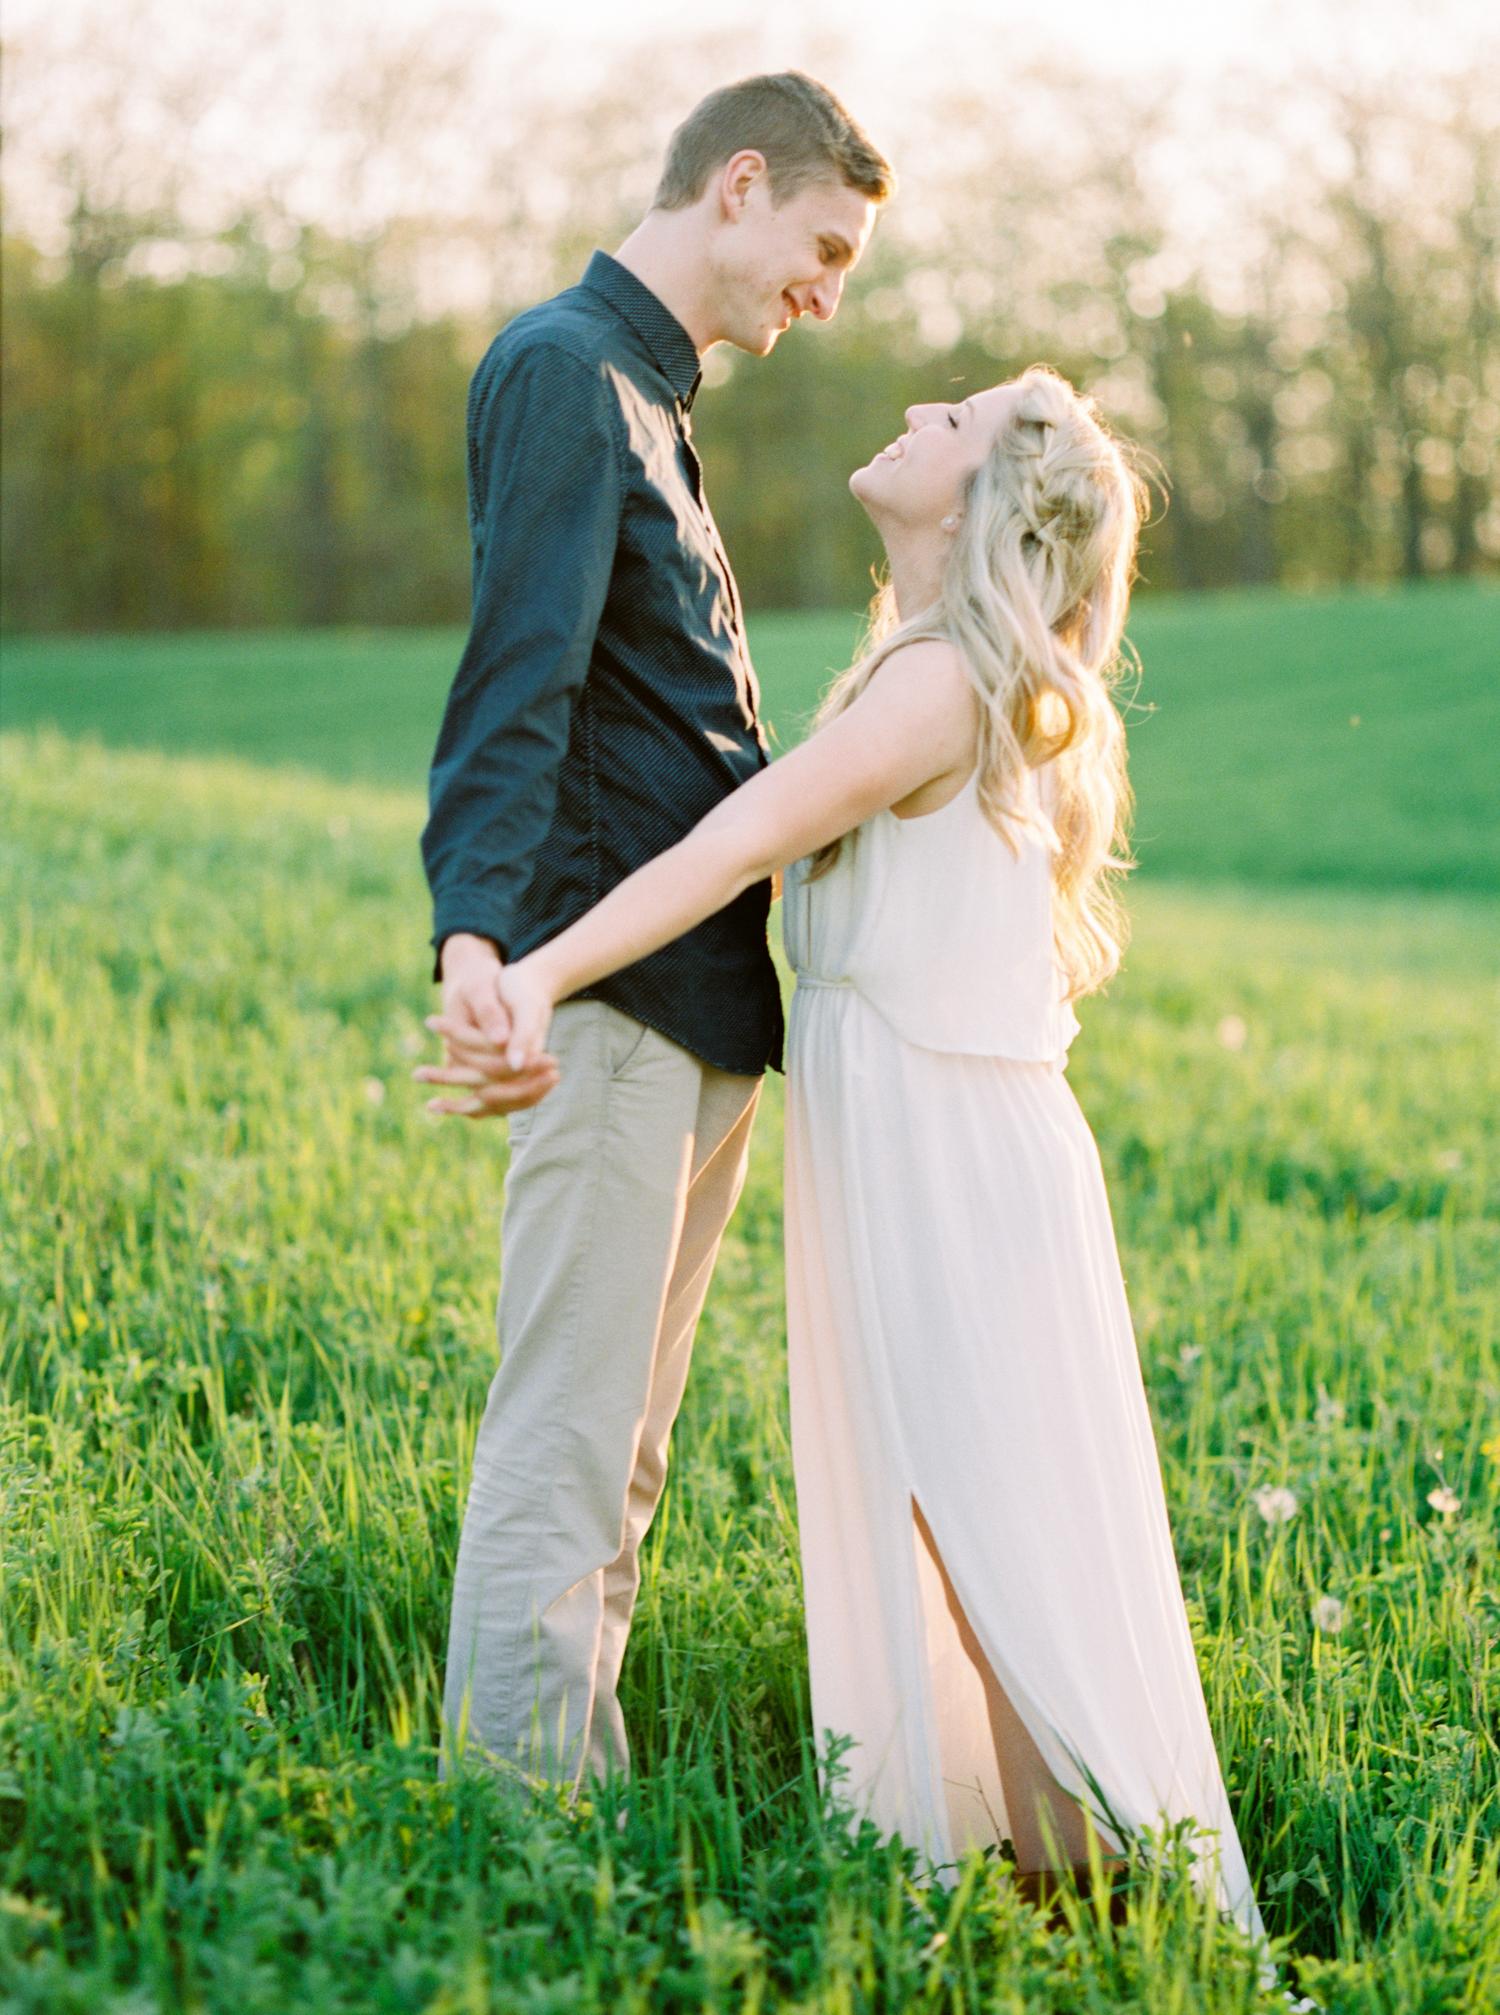 Katie-Nicolle-Niagara-Toronto-Muskoka-Wedding-13.jpg